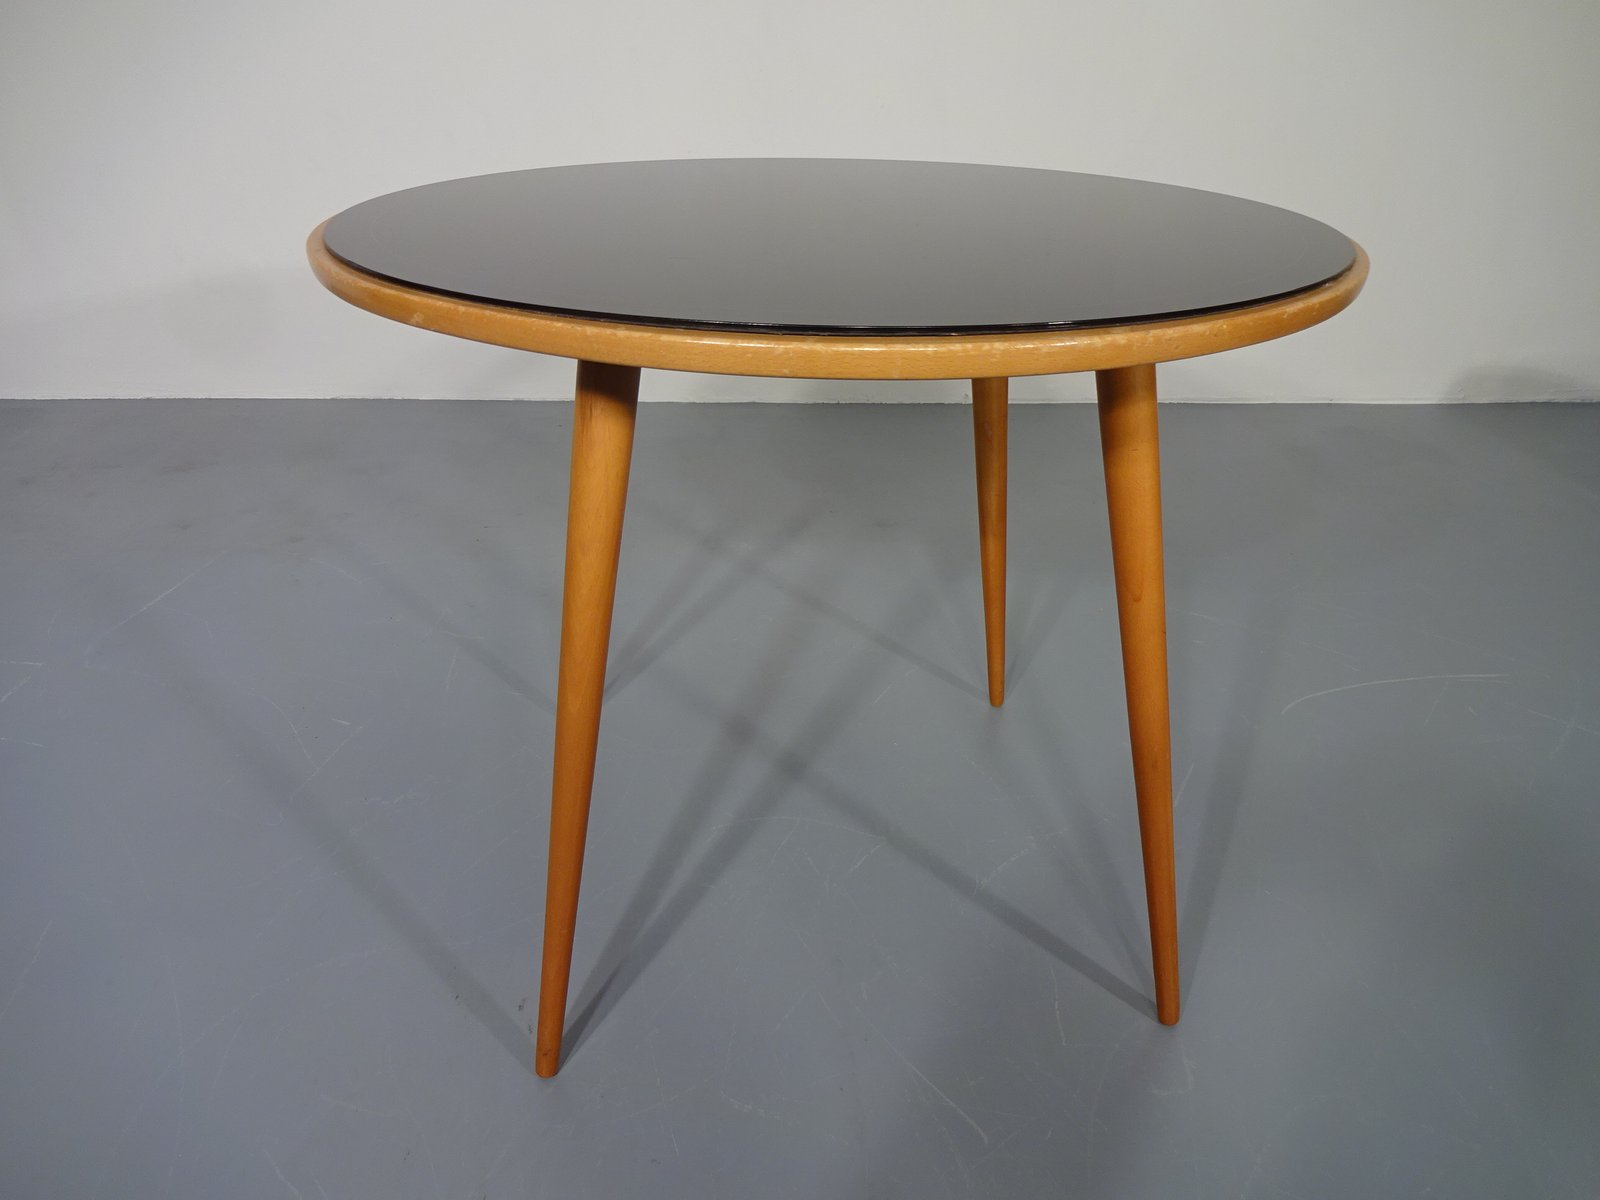 table en verre merisier 1960s en vente sur pamono. Black Bedroom Furniture Sets. Home Design Ideas